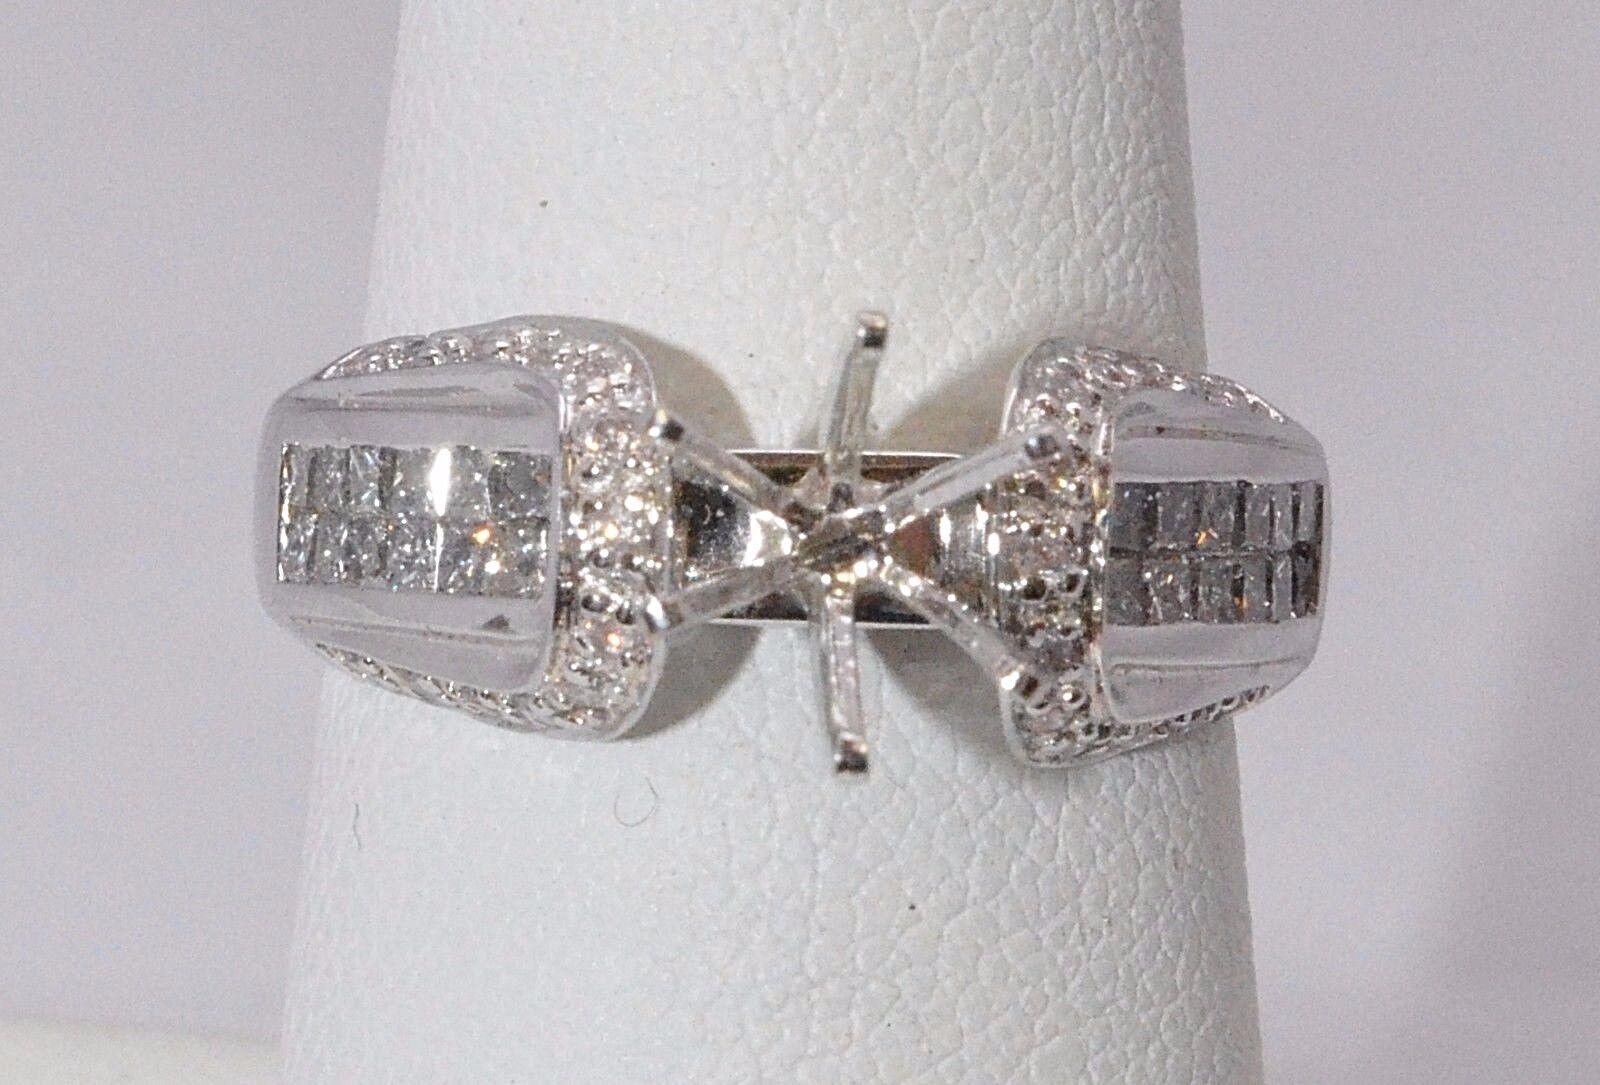 1822-14K WHITE gold DIAMOND SEMI MOUNT RING 0.68TCW 5.00 GRAMS SIZE 7.25